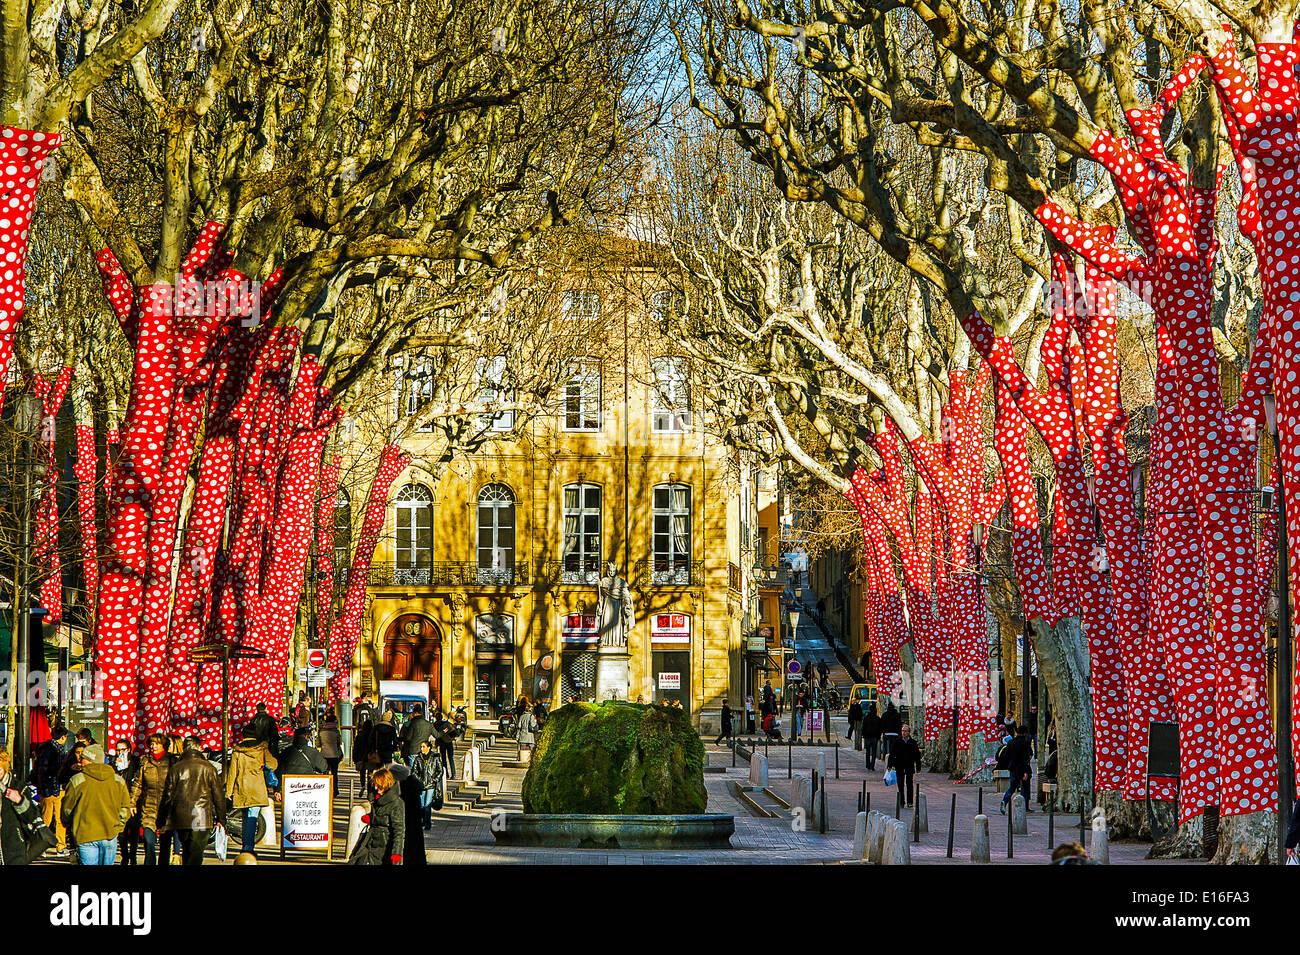 Europe, France, Bouches-du-Rhone, Aix-en-Provence. European Capital of Culture 2013. Cours Mirabeau. - Stock Image